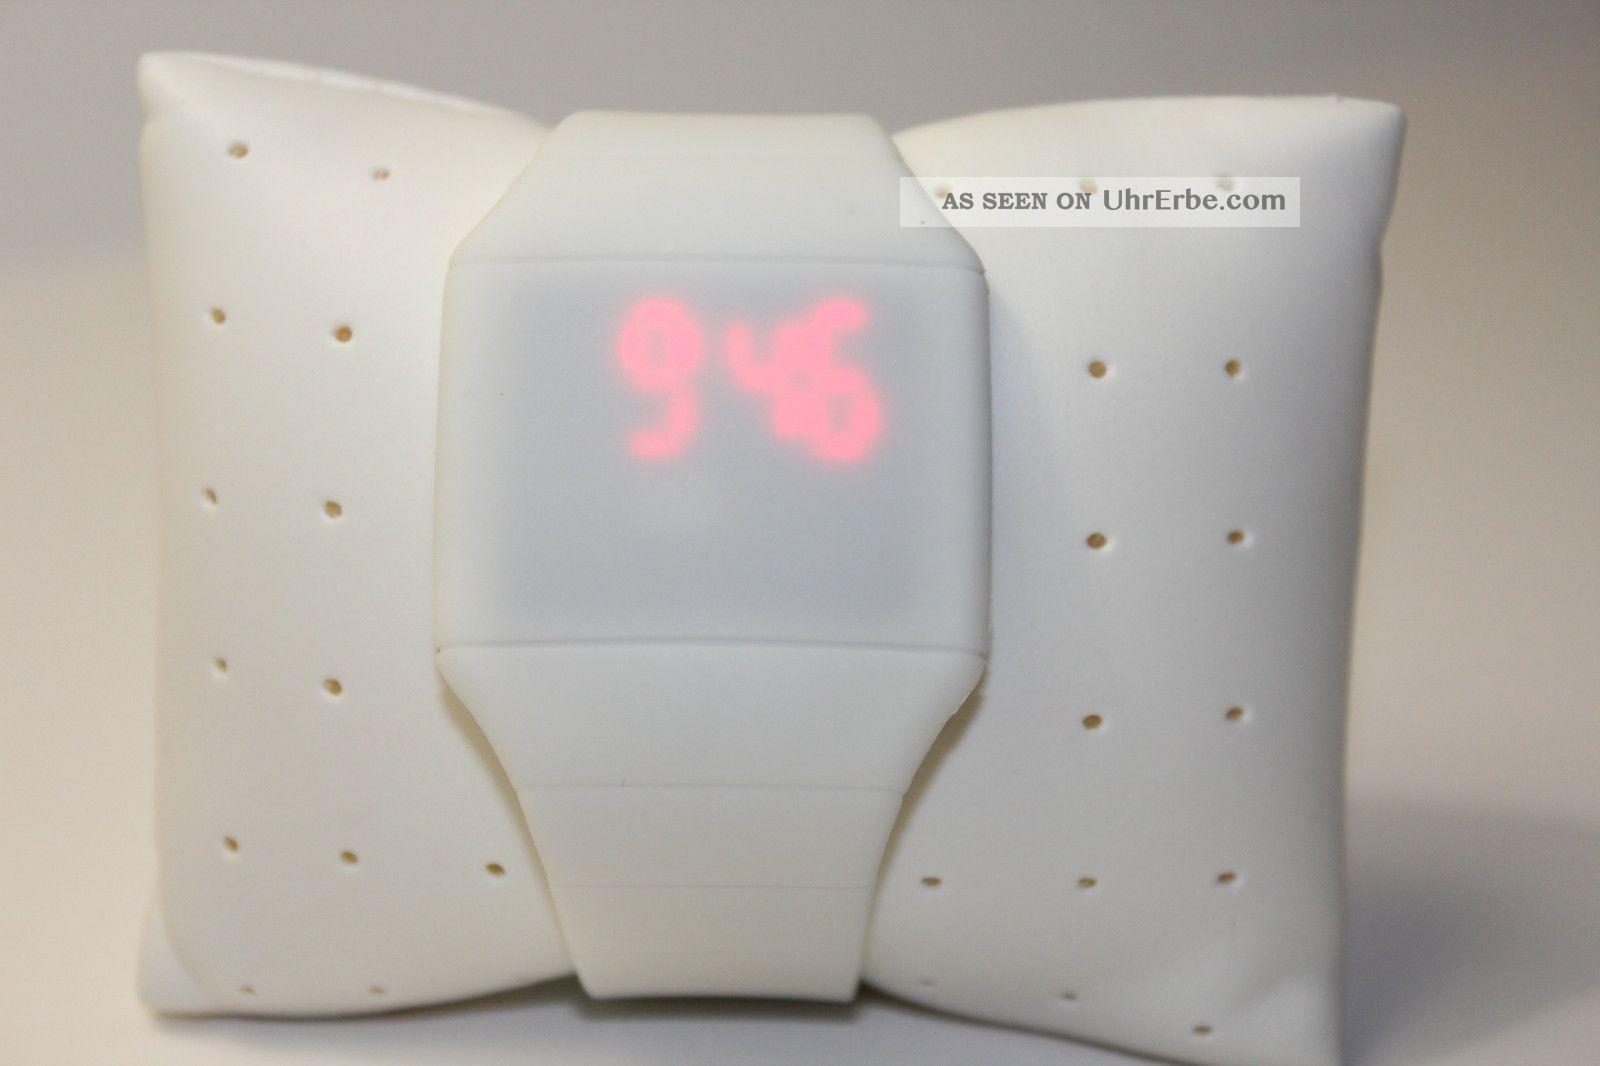 Weiß Digital Led Touch Screen Uhr Mit Silikonarmband Weiß Armbanduhren Bild